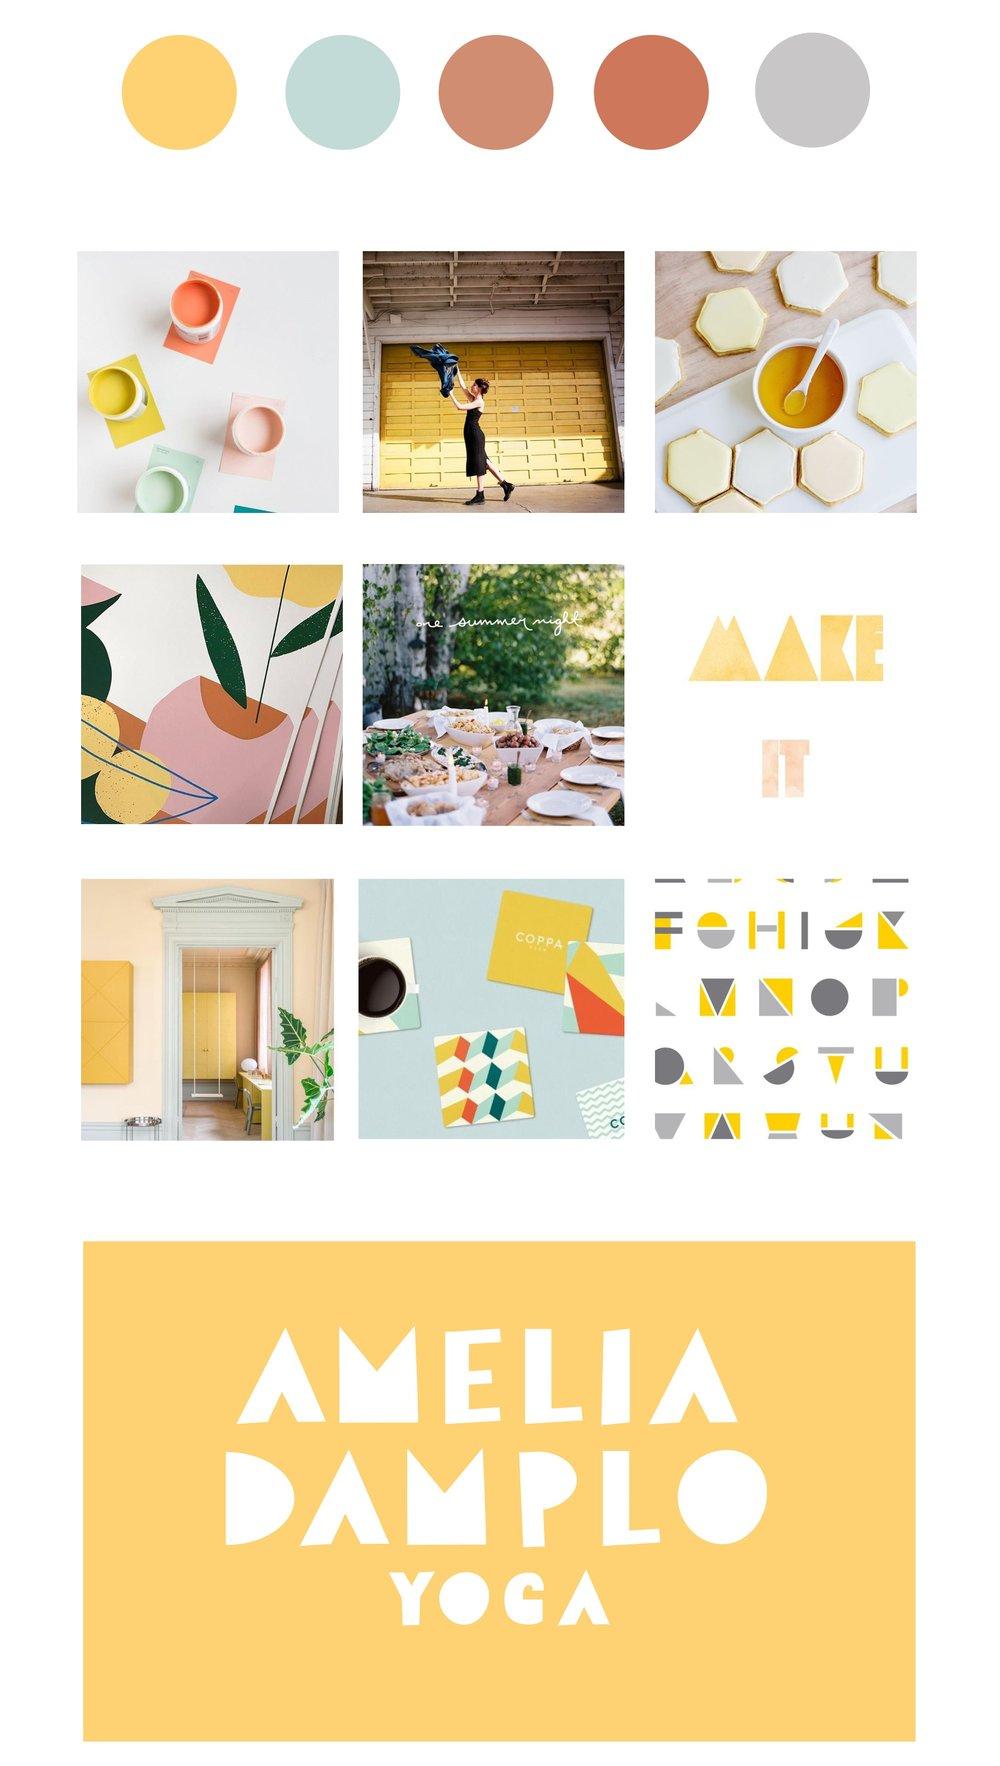 Amelia+Damplo+Yoga+Pinterest.jpg